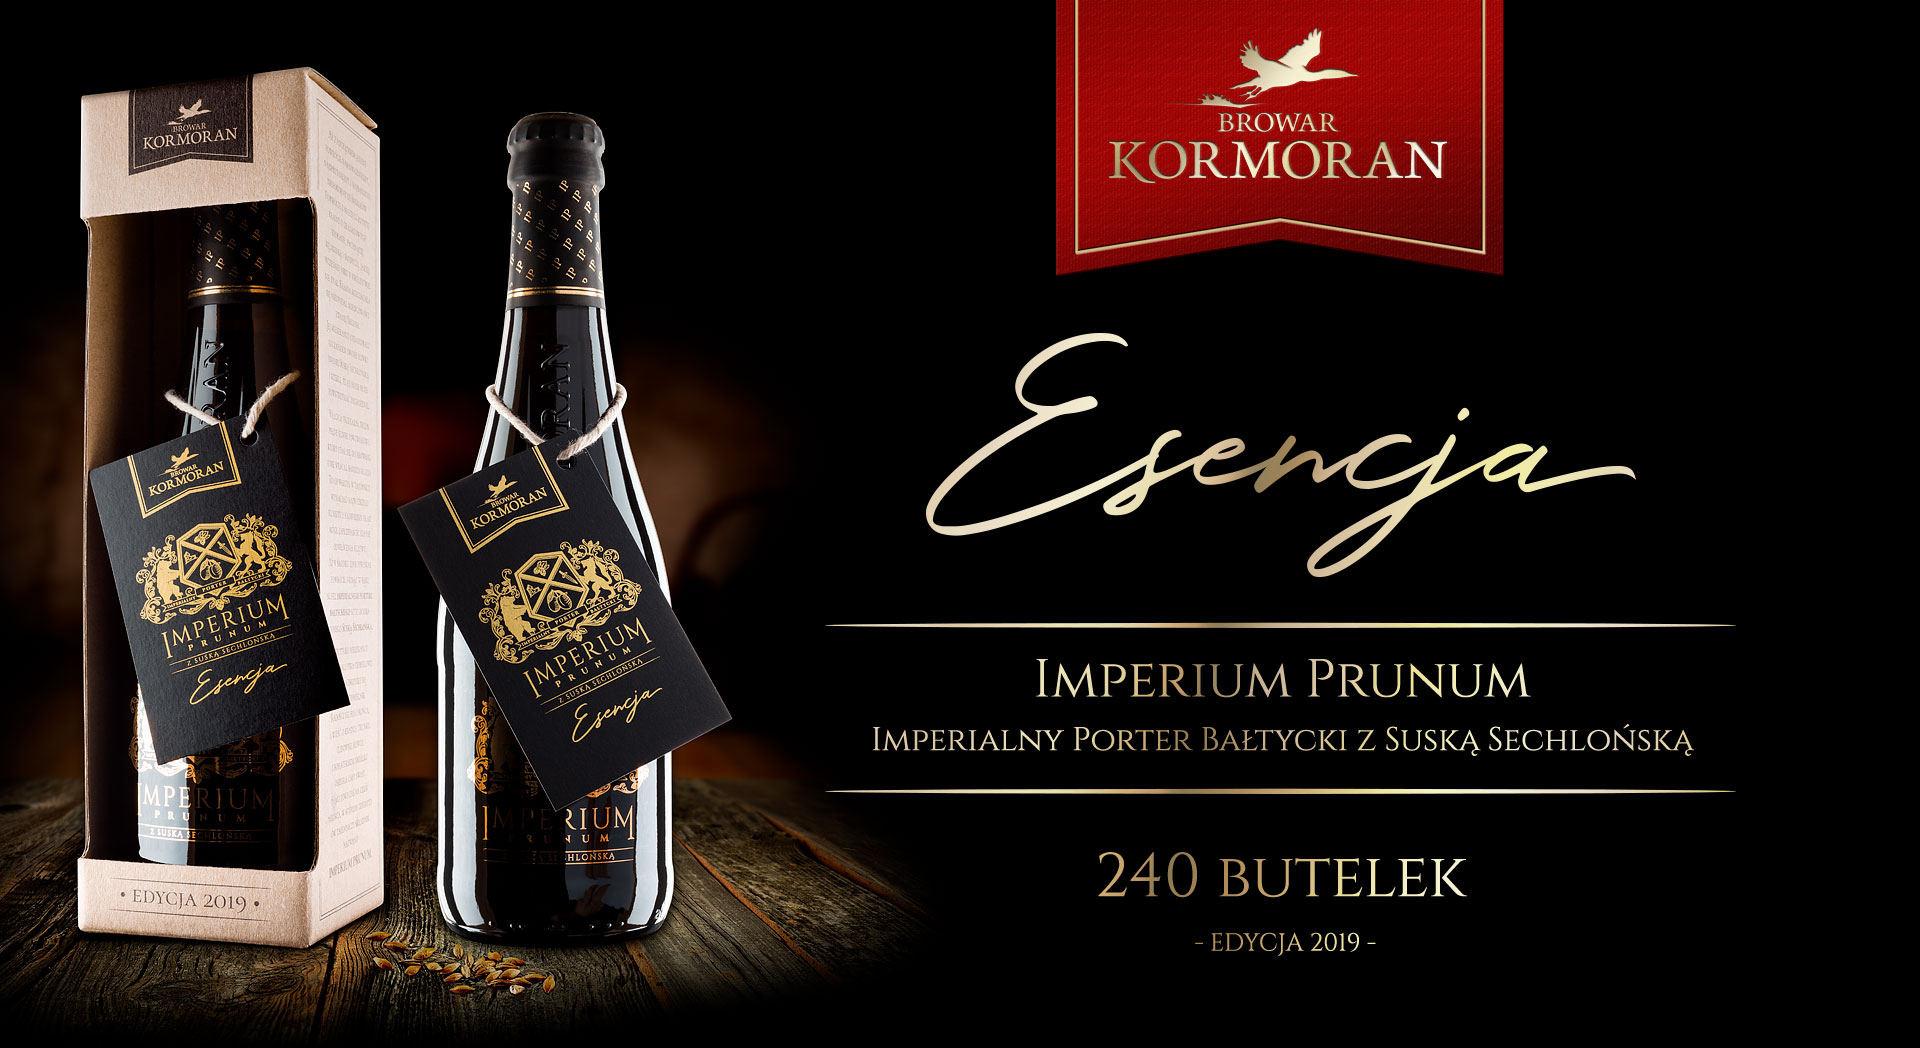 Piwo Imperium Prunum Esencja 2018 - Browar Kormoran